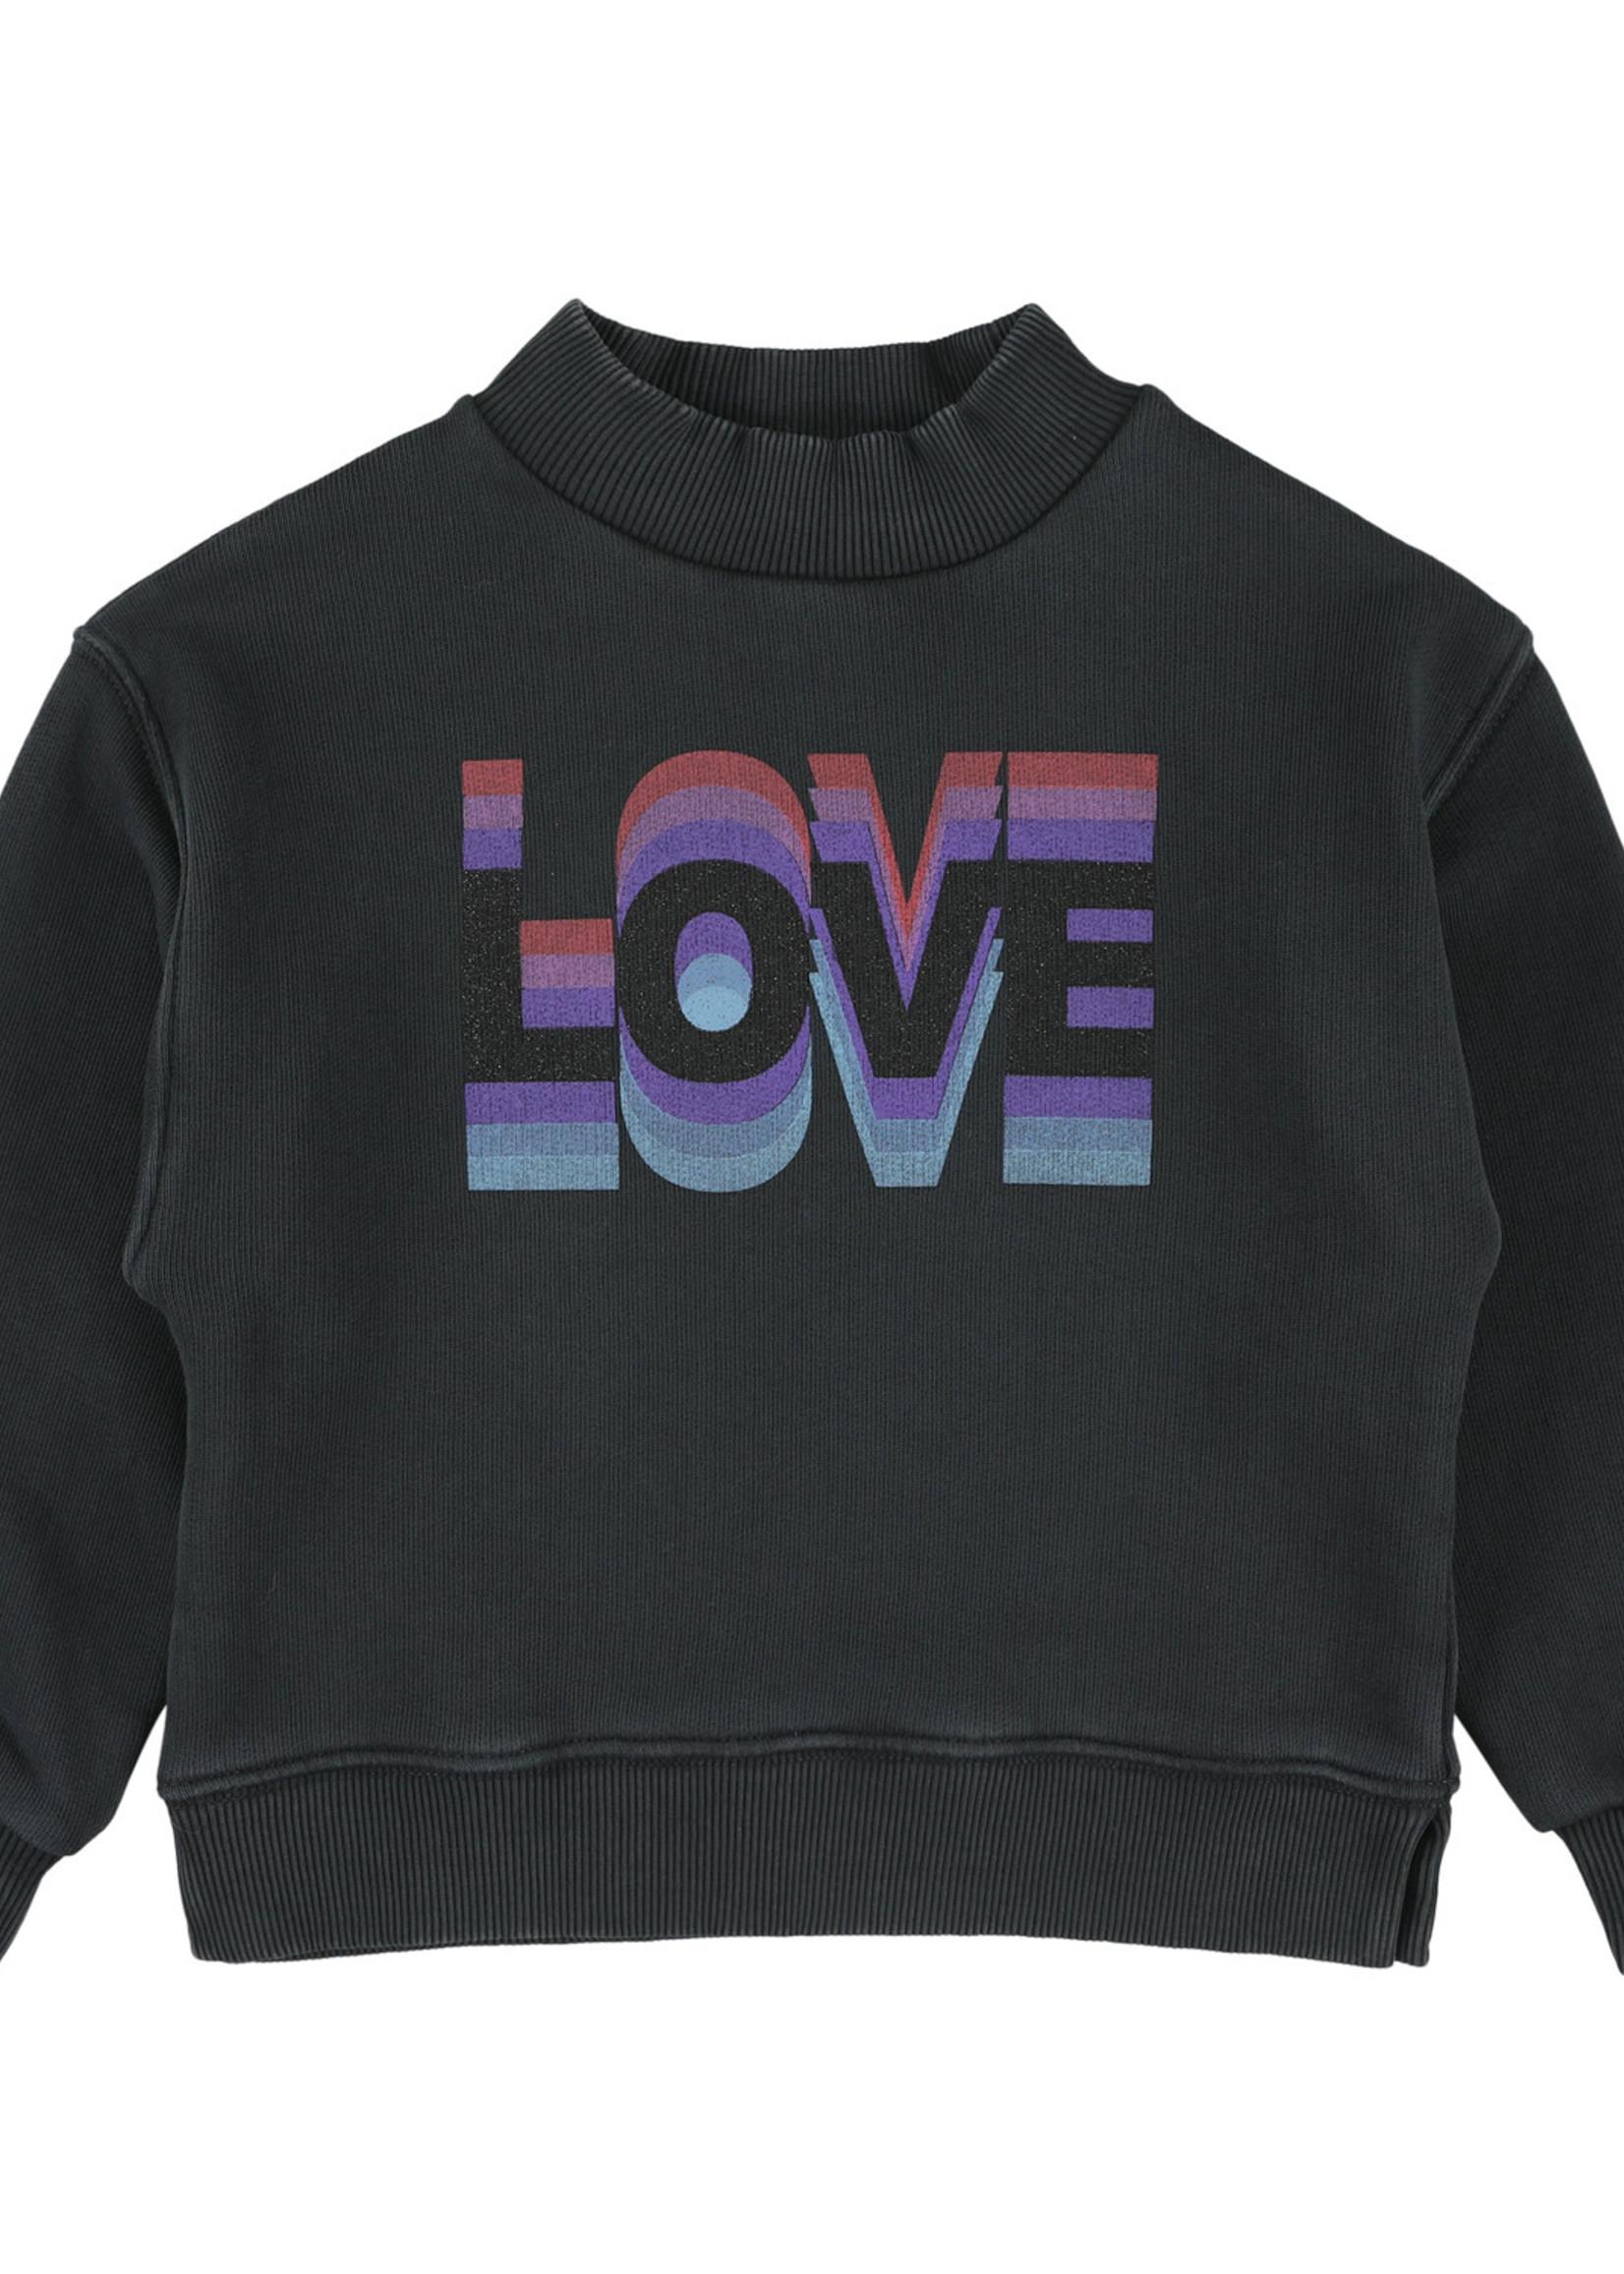 SIMPLE KIDS SK SWEAT LOVE SWEAT COAL